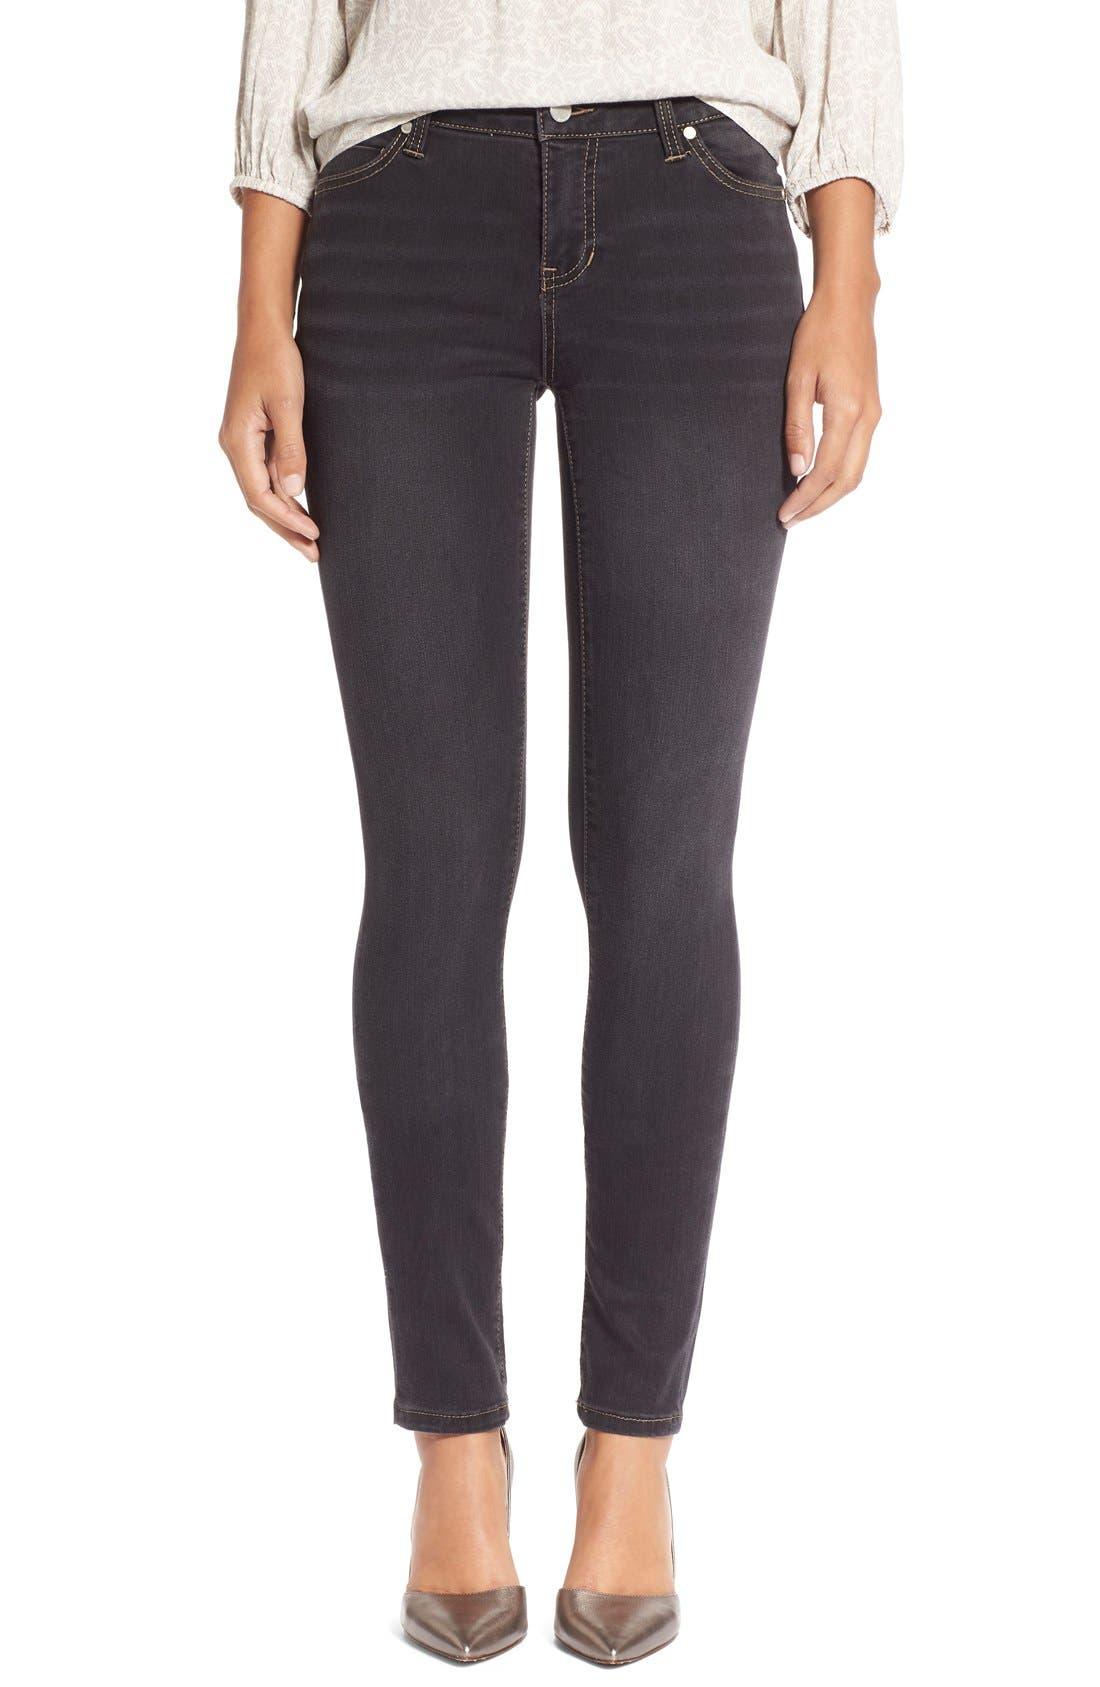 Petite Women's Liverpool Abby Stretch Skinny Jeans